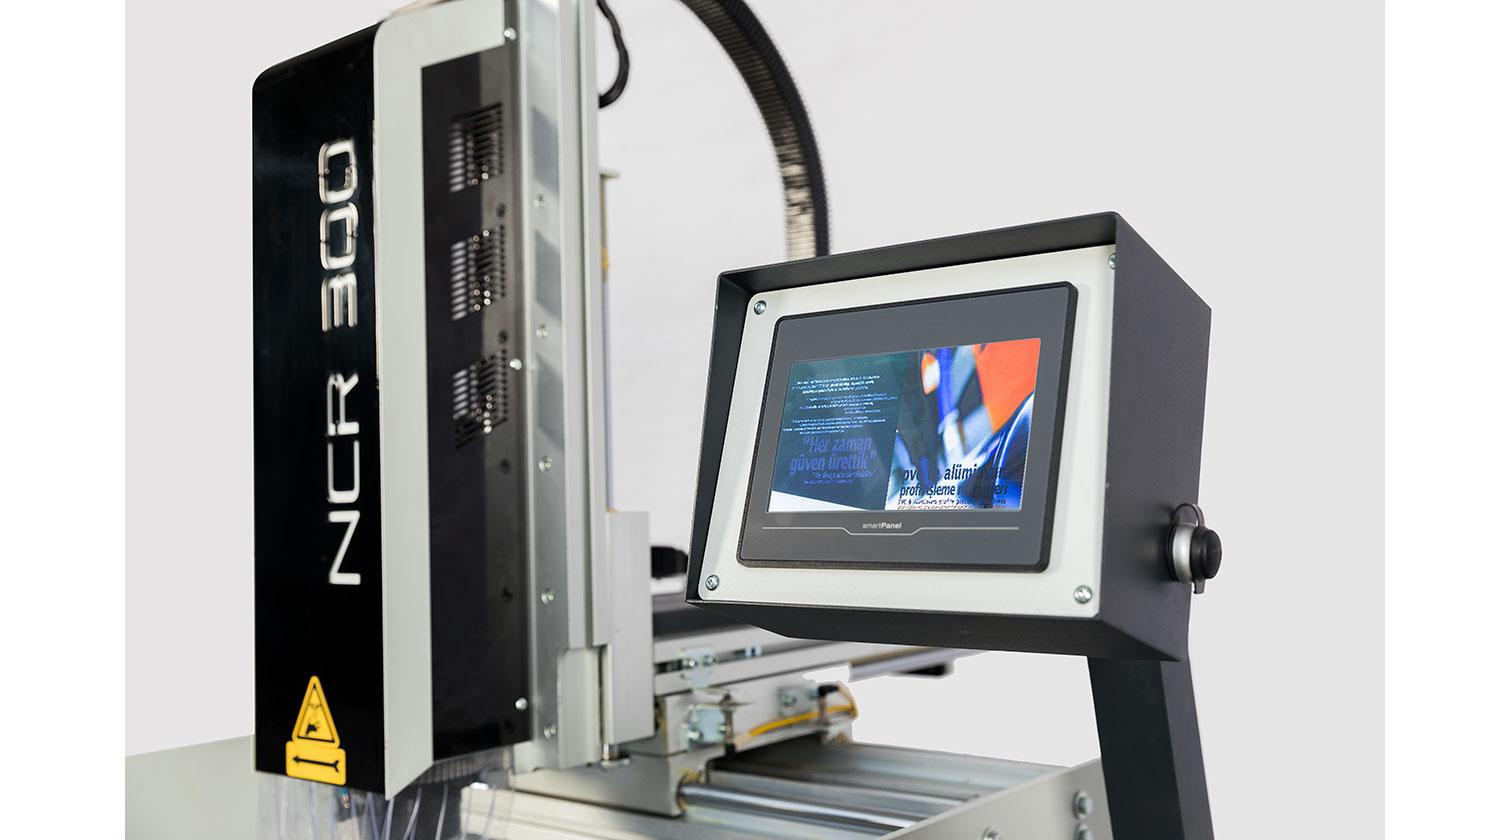 INT aluminum CN copy router Yilmaz NCR 300 operator interface